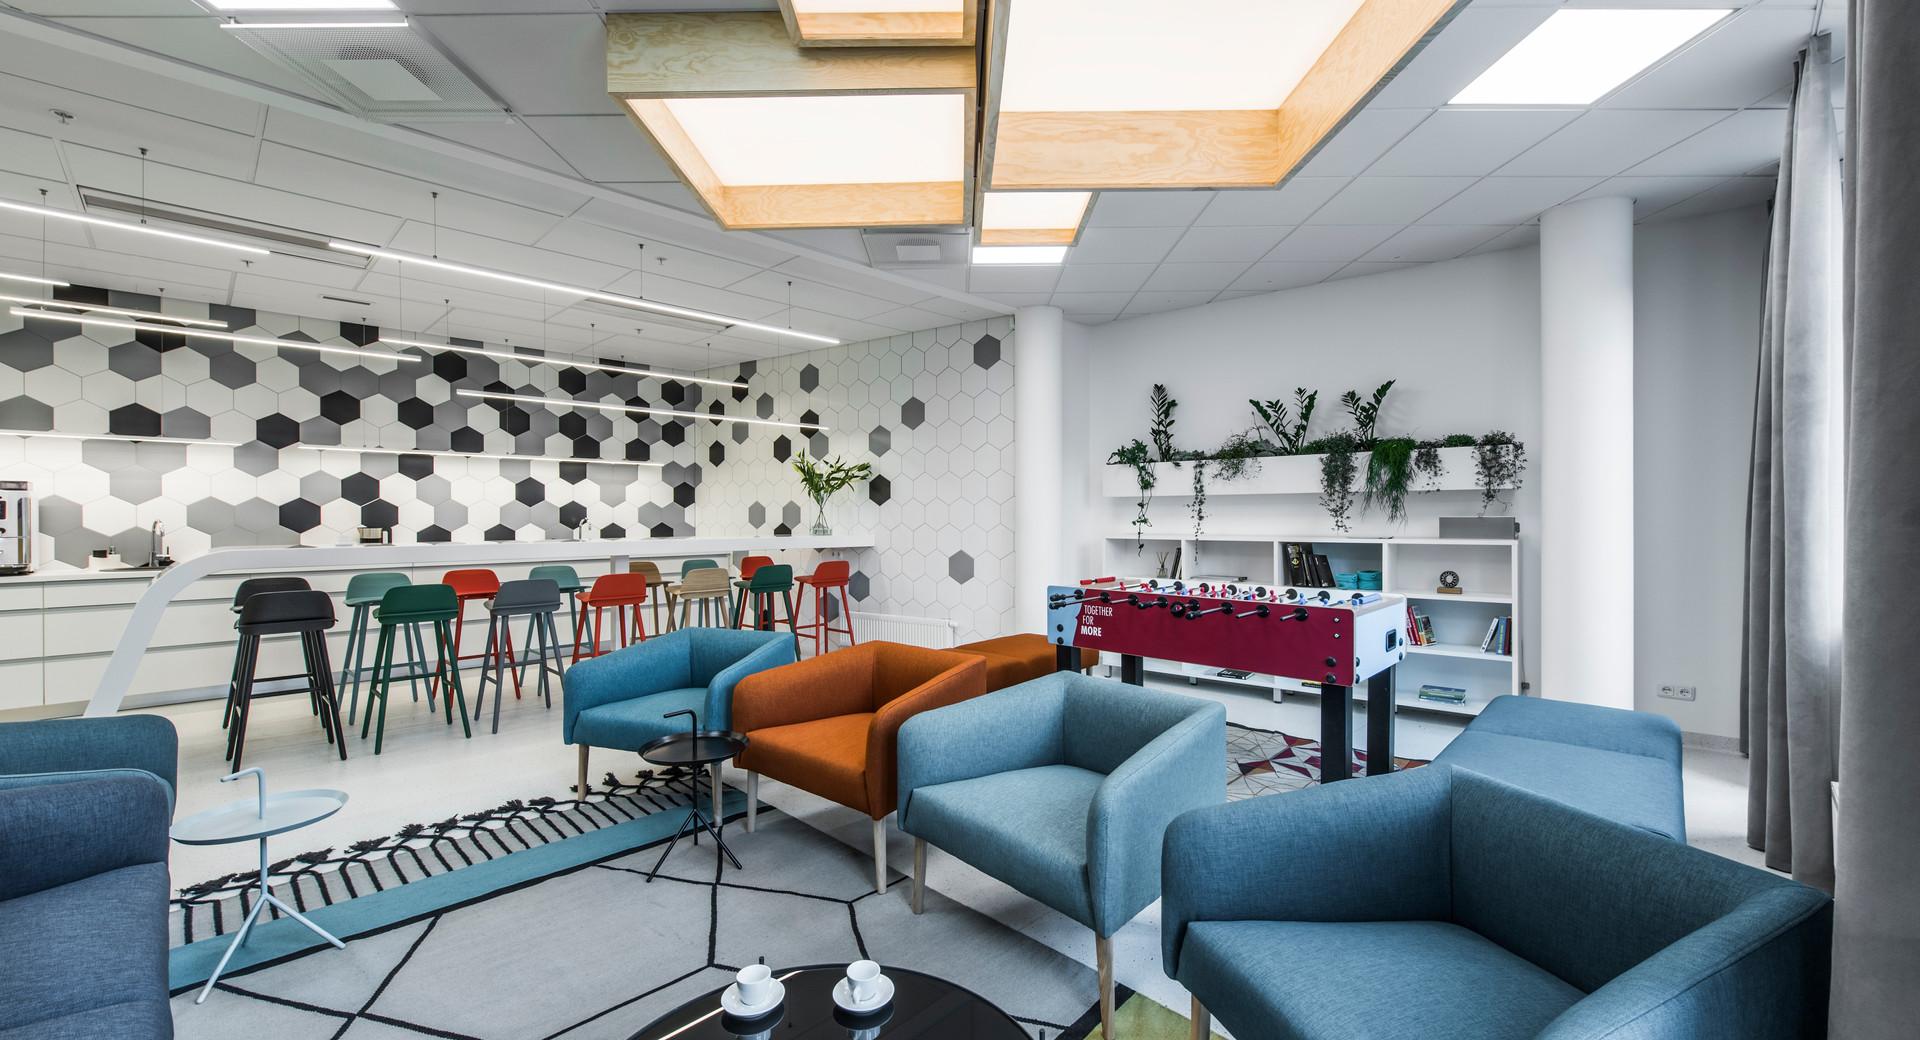 BROLIAISHAUNUOLIAI interior design 82